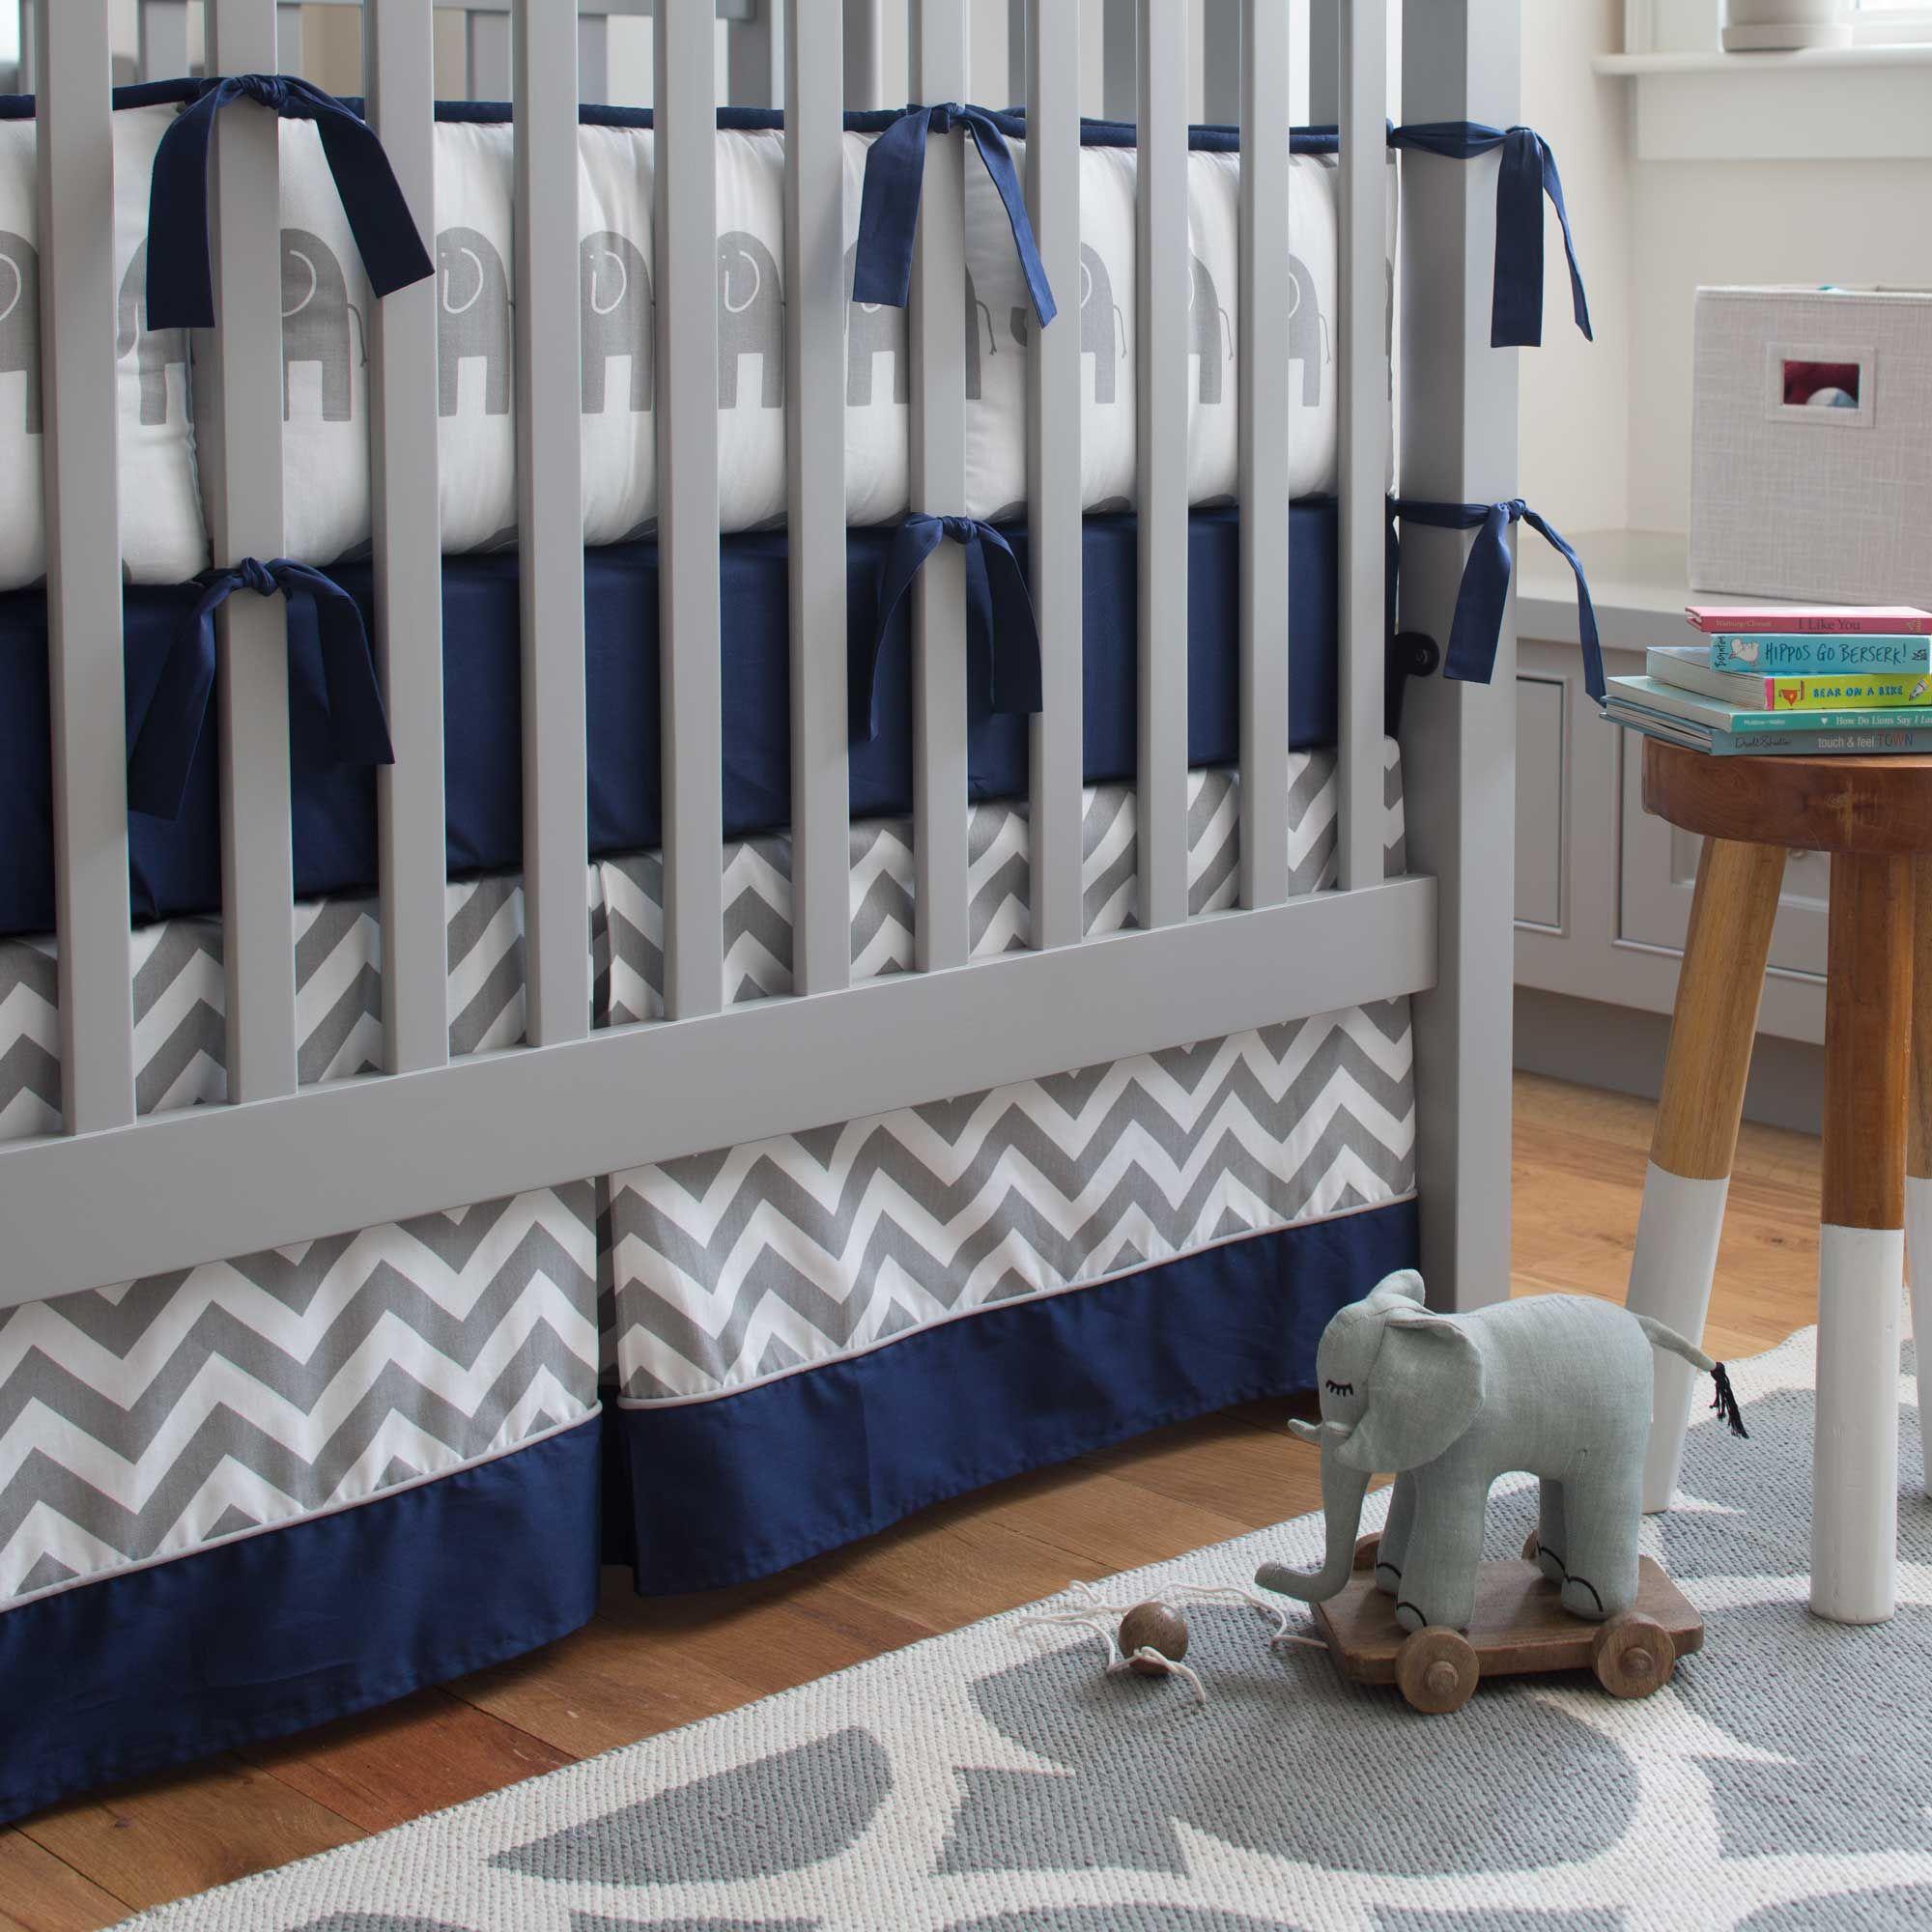 Navy and Gray Elephants Baby Crib Bedding